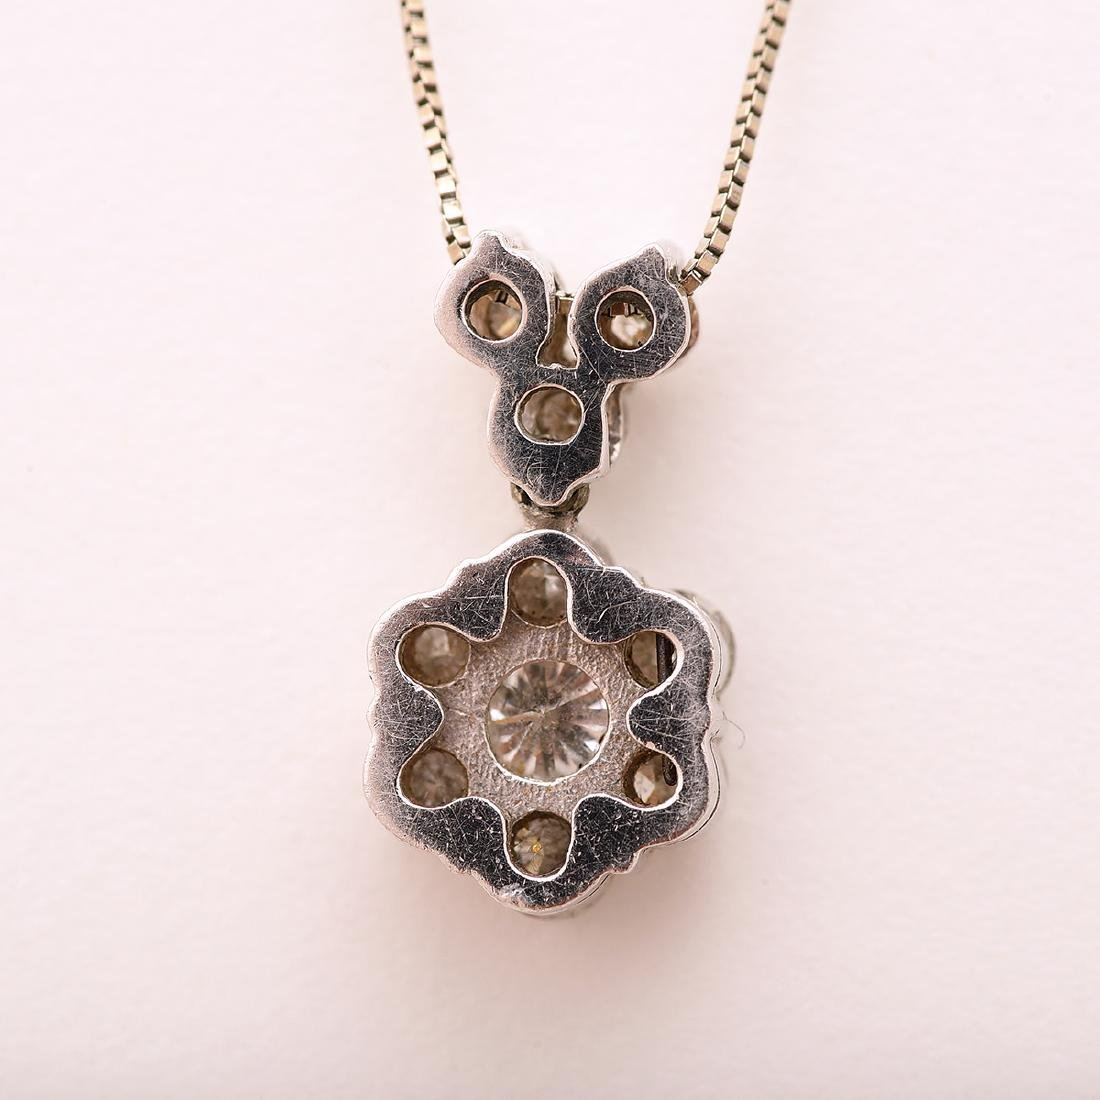 Diamond, 14k White Gold Pendant Necklace. - 3